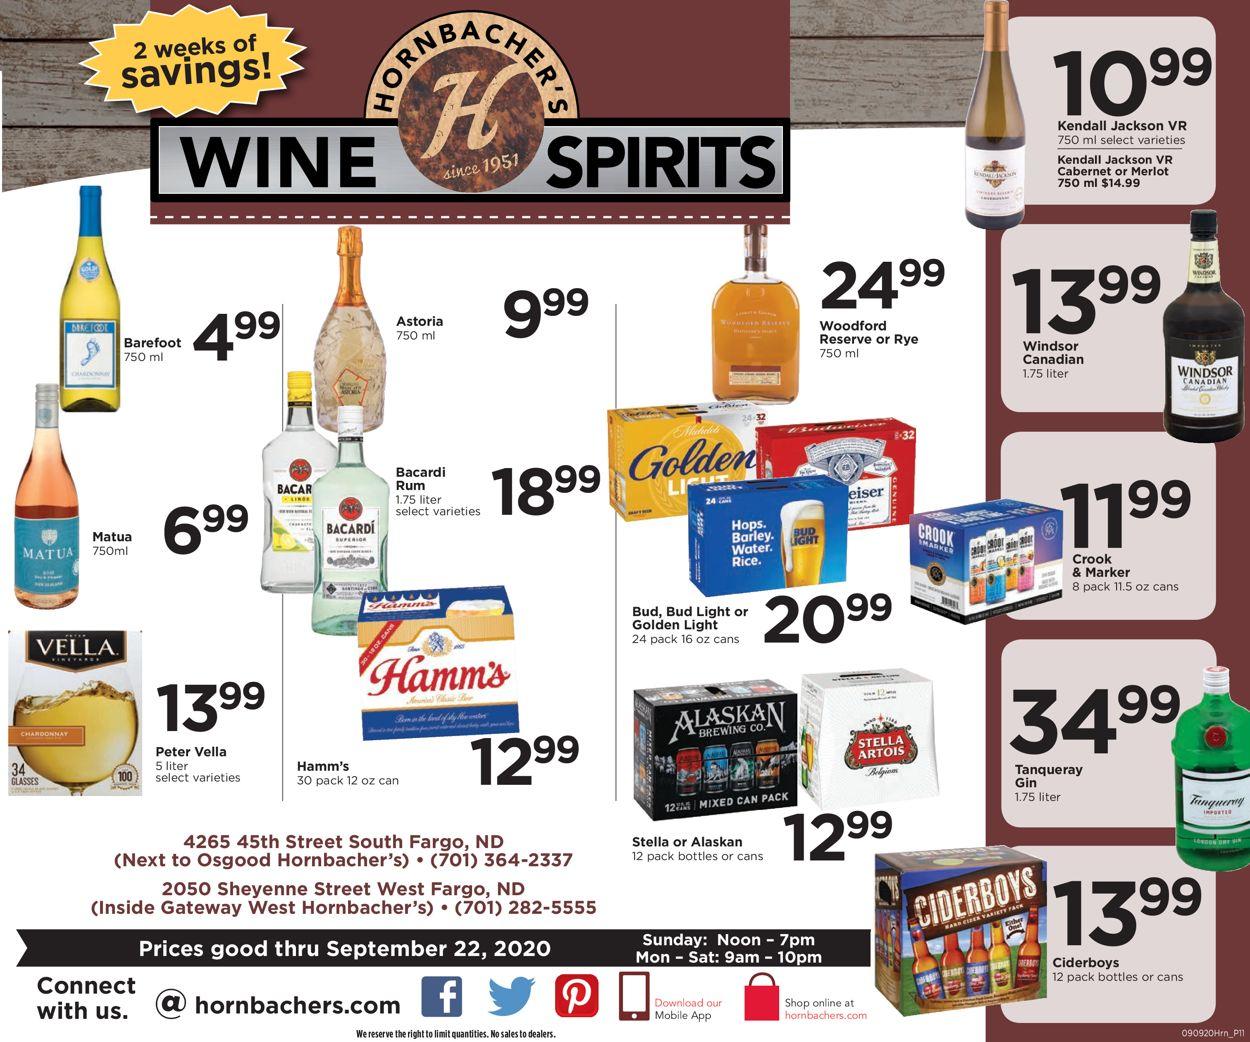 Hornbacher's Weekly Ad Circular - valid 09/09-09/22/2020